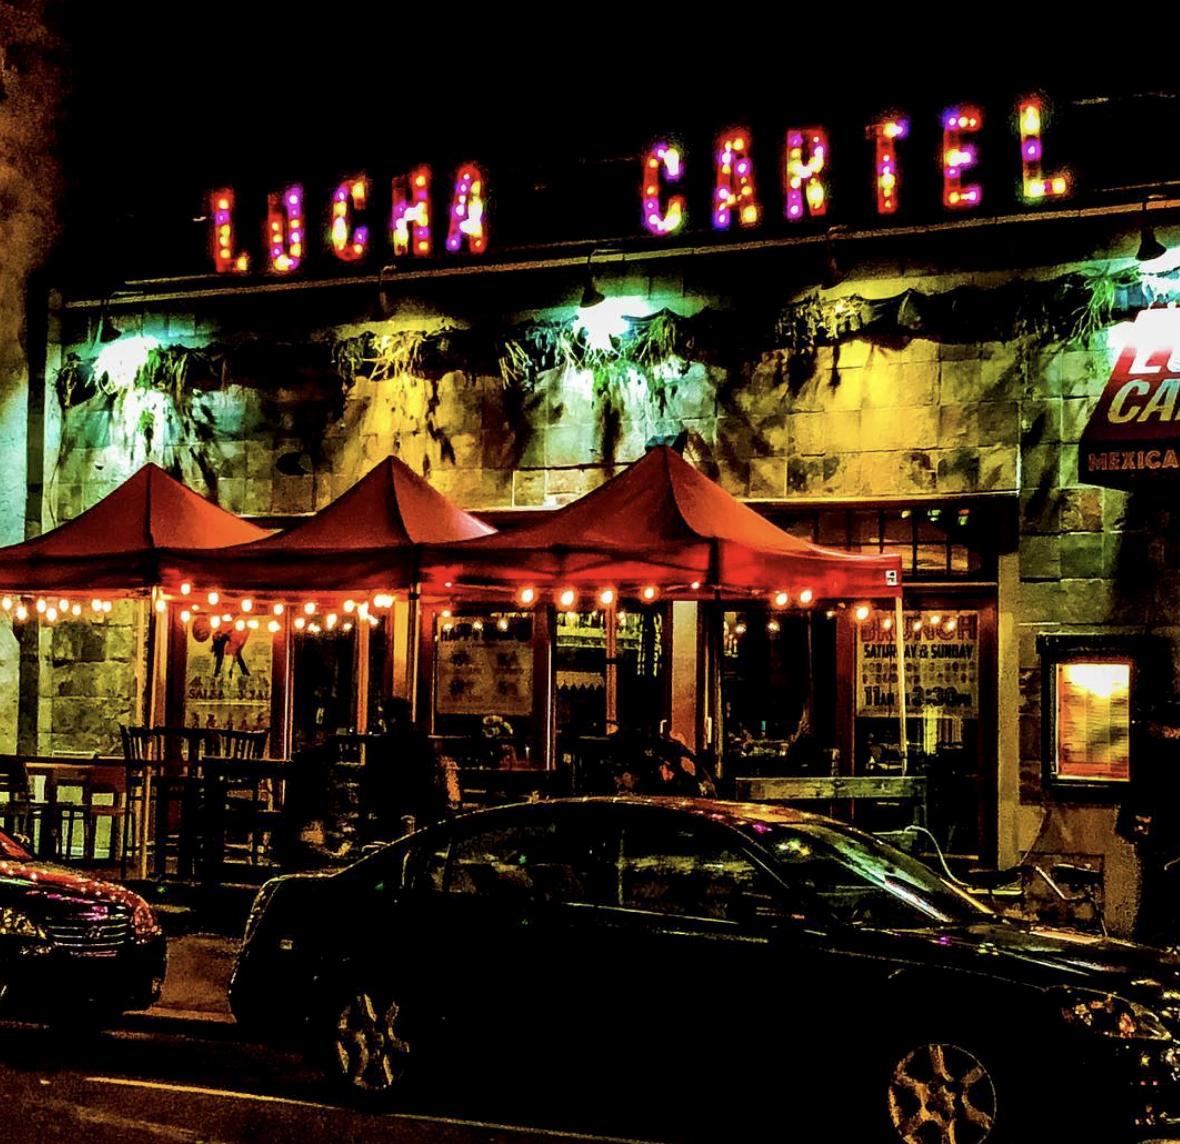 Lucha Cartel at night - Photo courtesy of @Social1028_